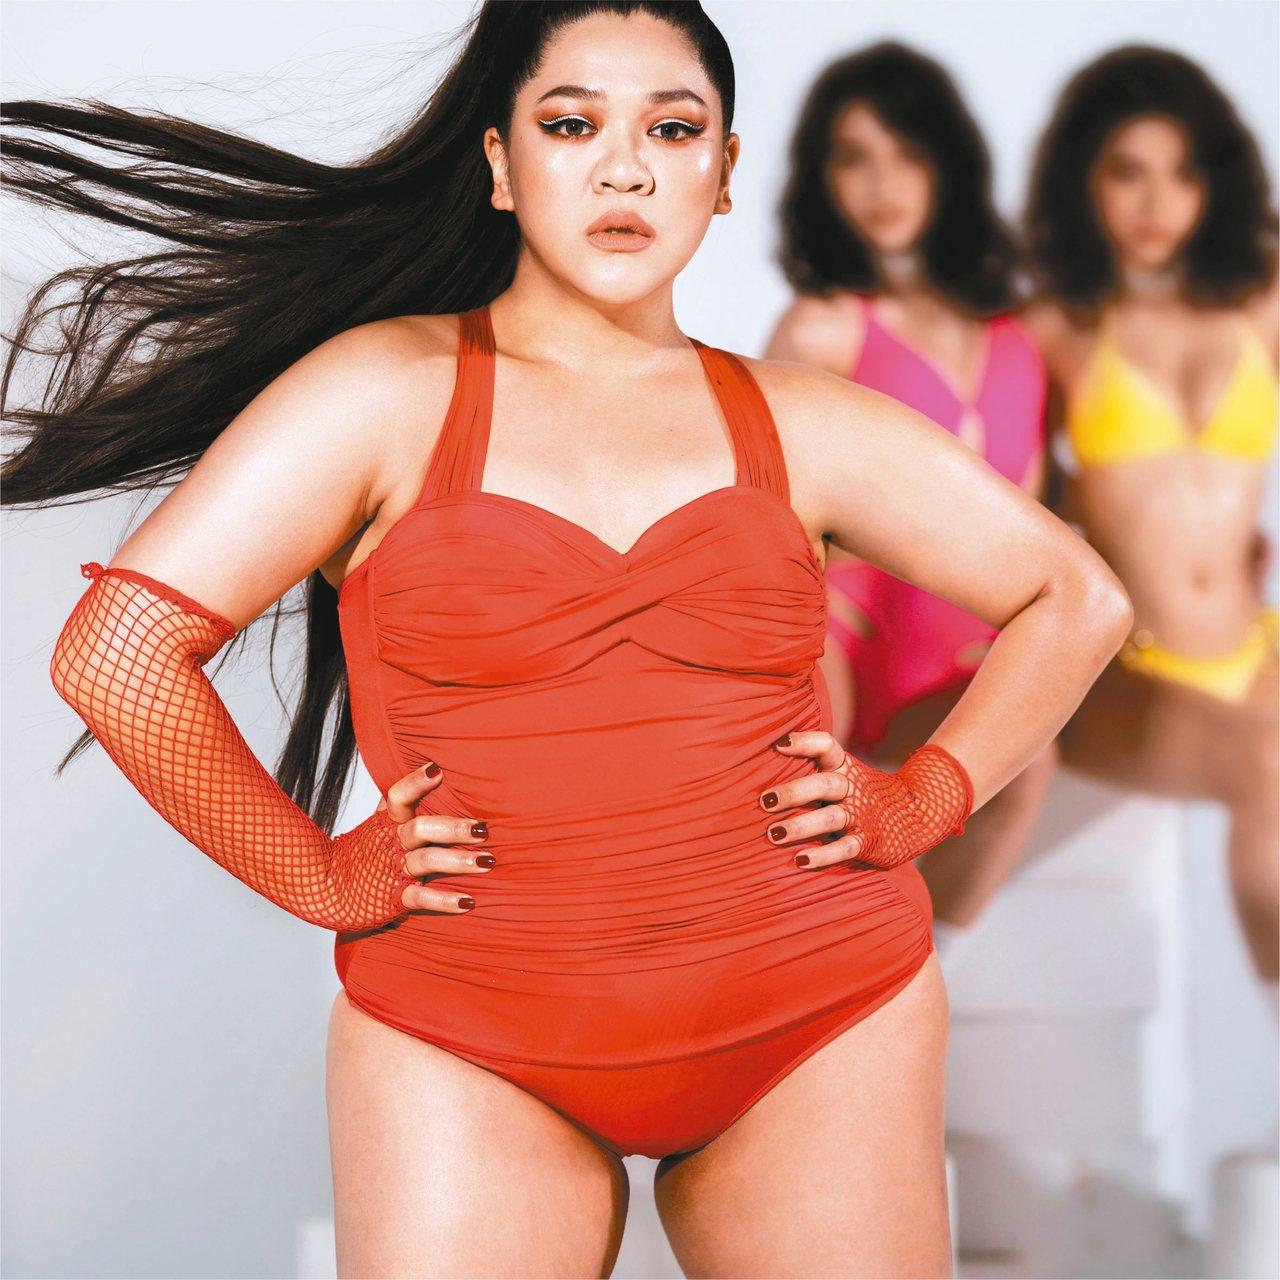 Voda Swim邀請穿搭風格鮮明的女星劉紀範Amanda入鏡形象廣告,宣揚撕去...